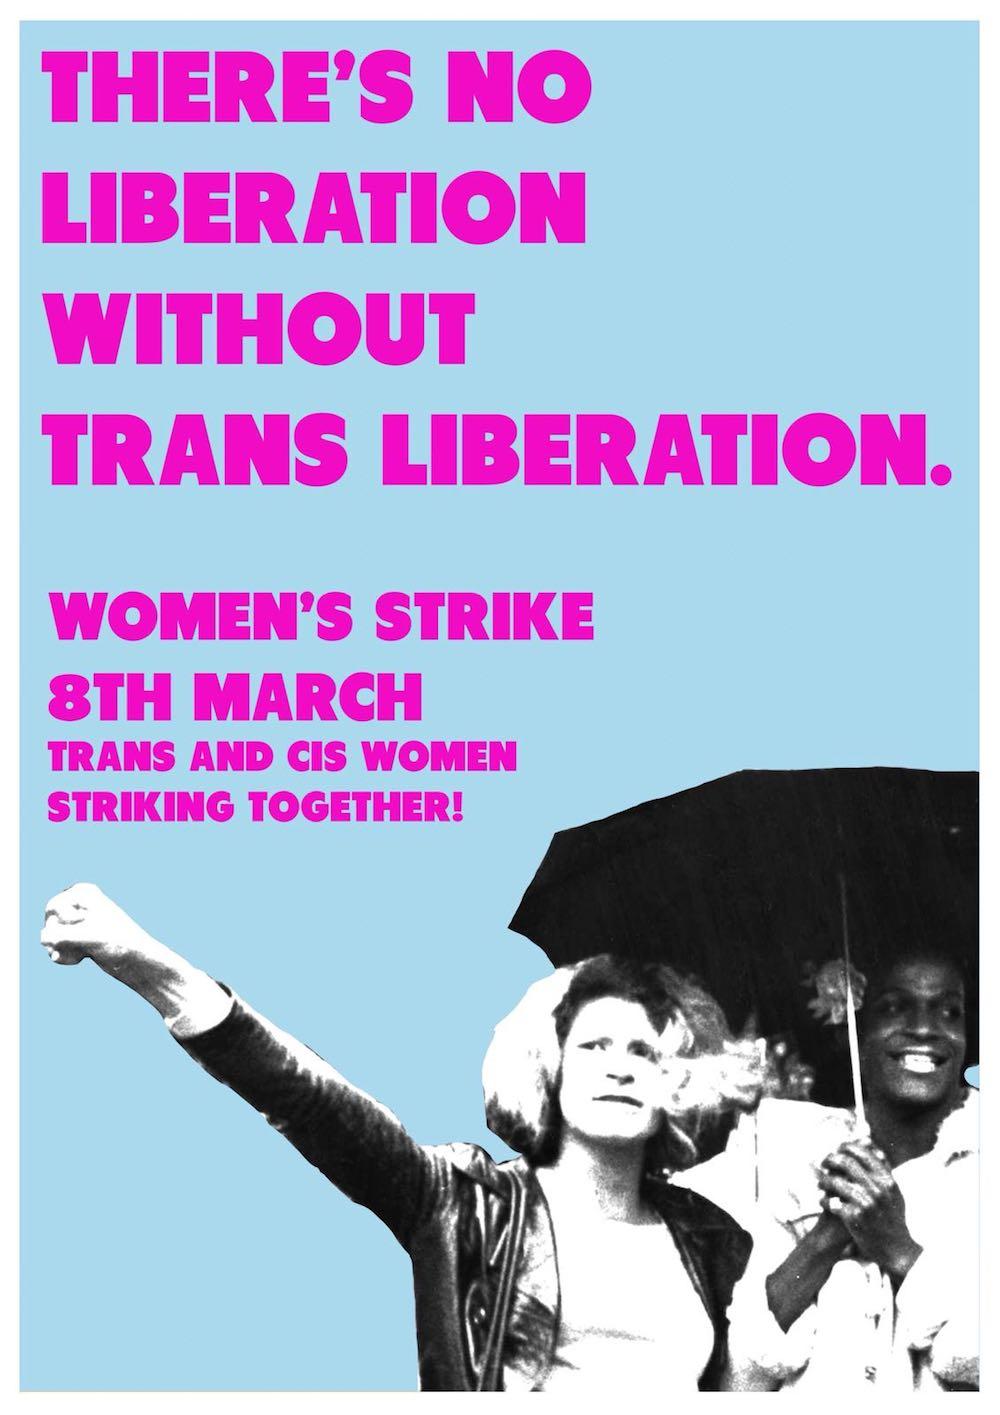 Poster for the Women's Strike, 2018